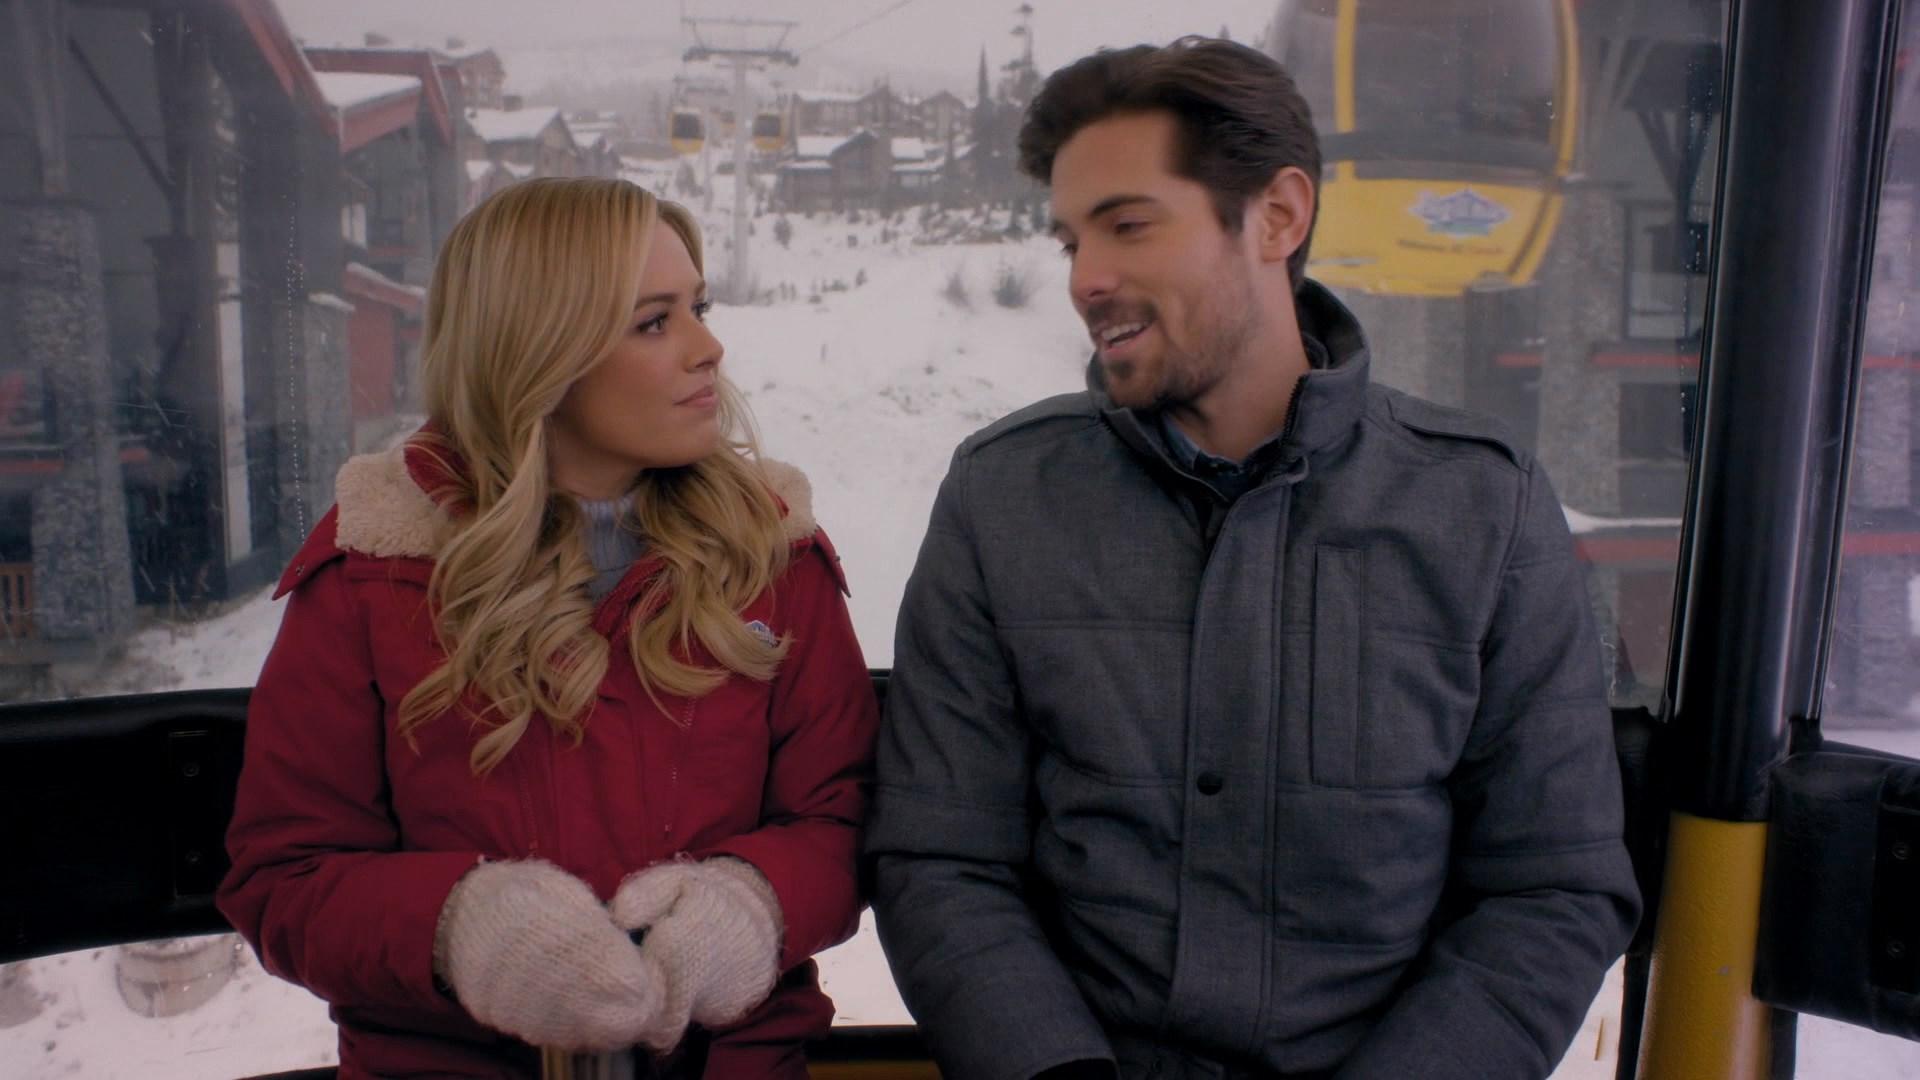 Princesa en la nieve (2019) 1080p WEB-DL AMZN Latino